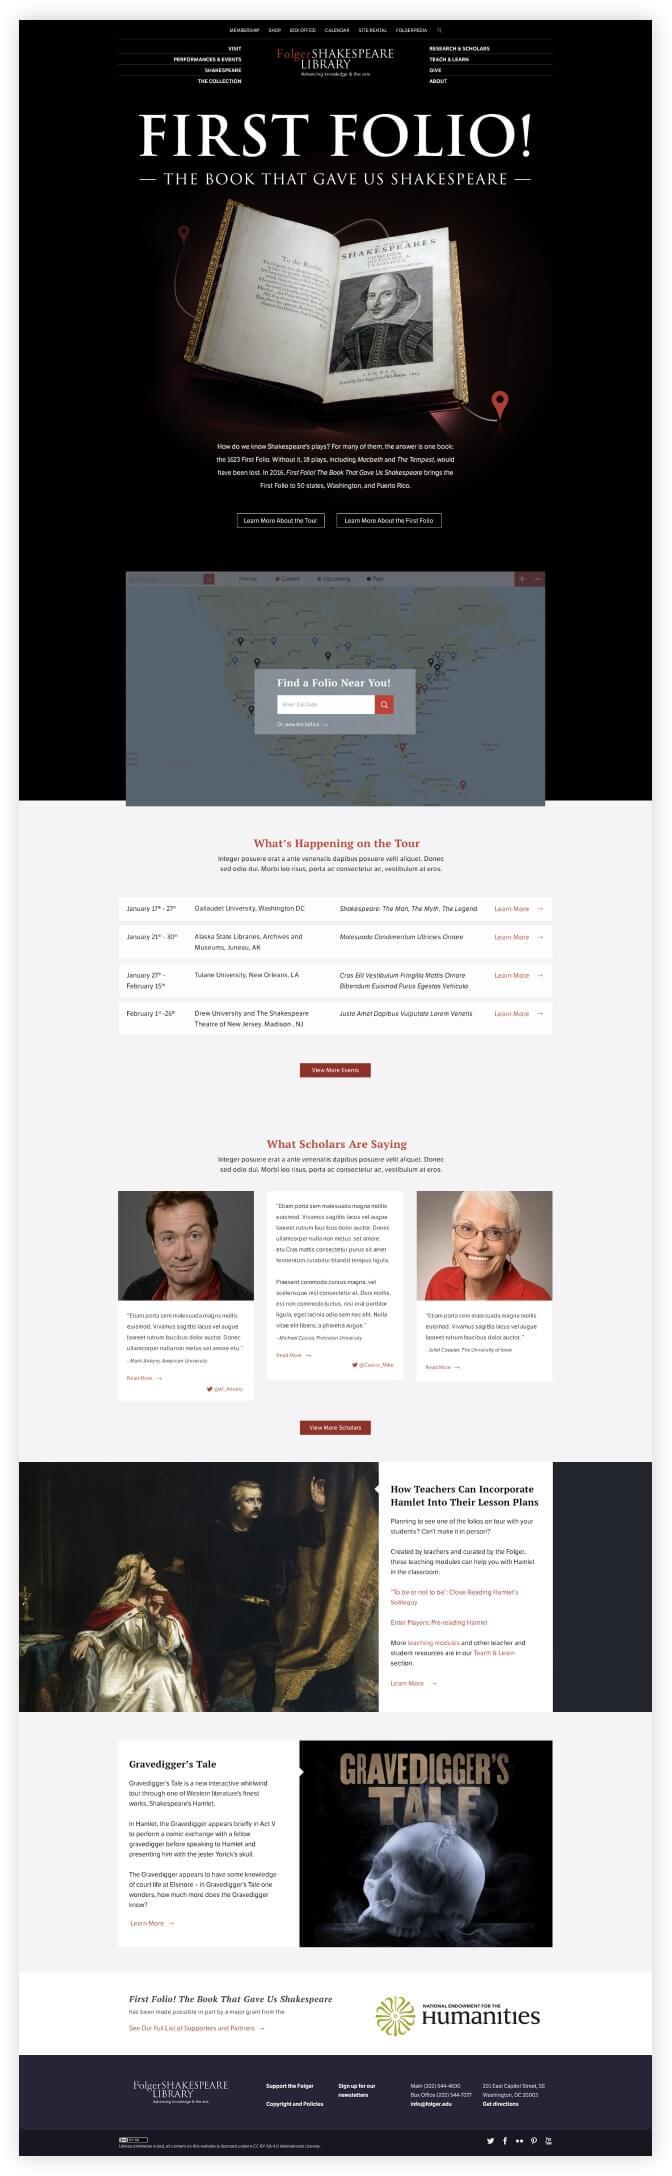 first folio website homepage screenshot